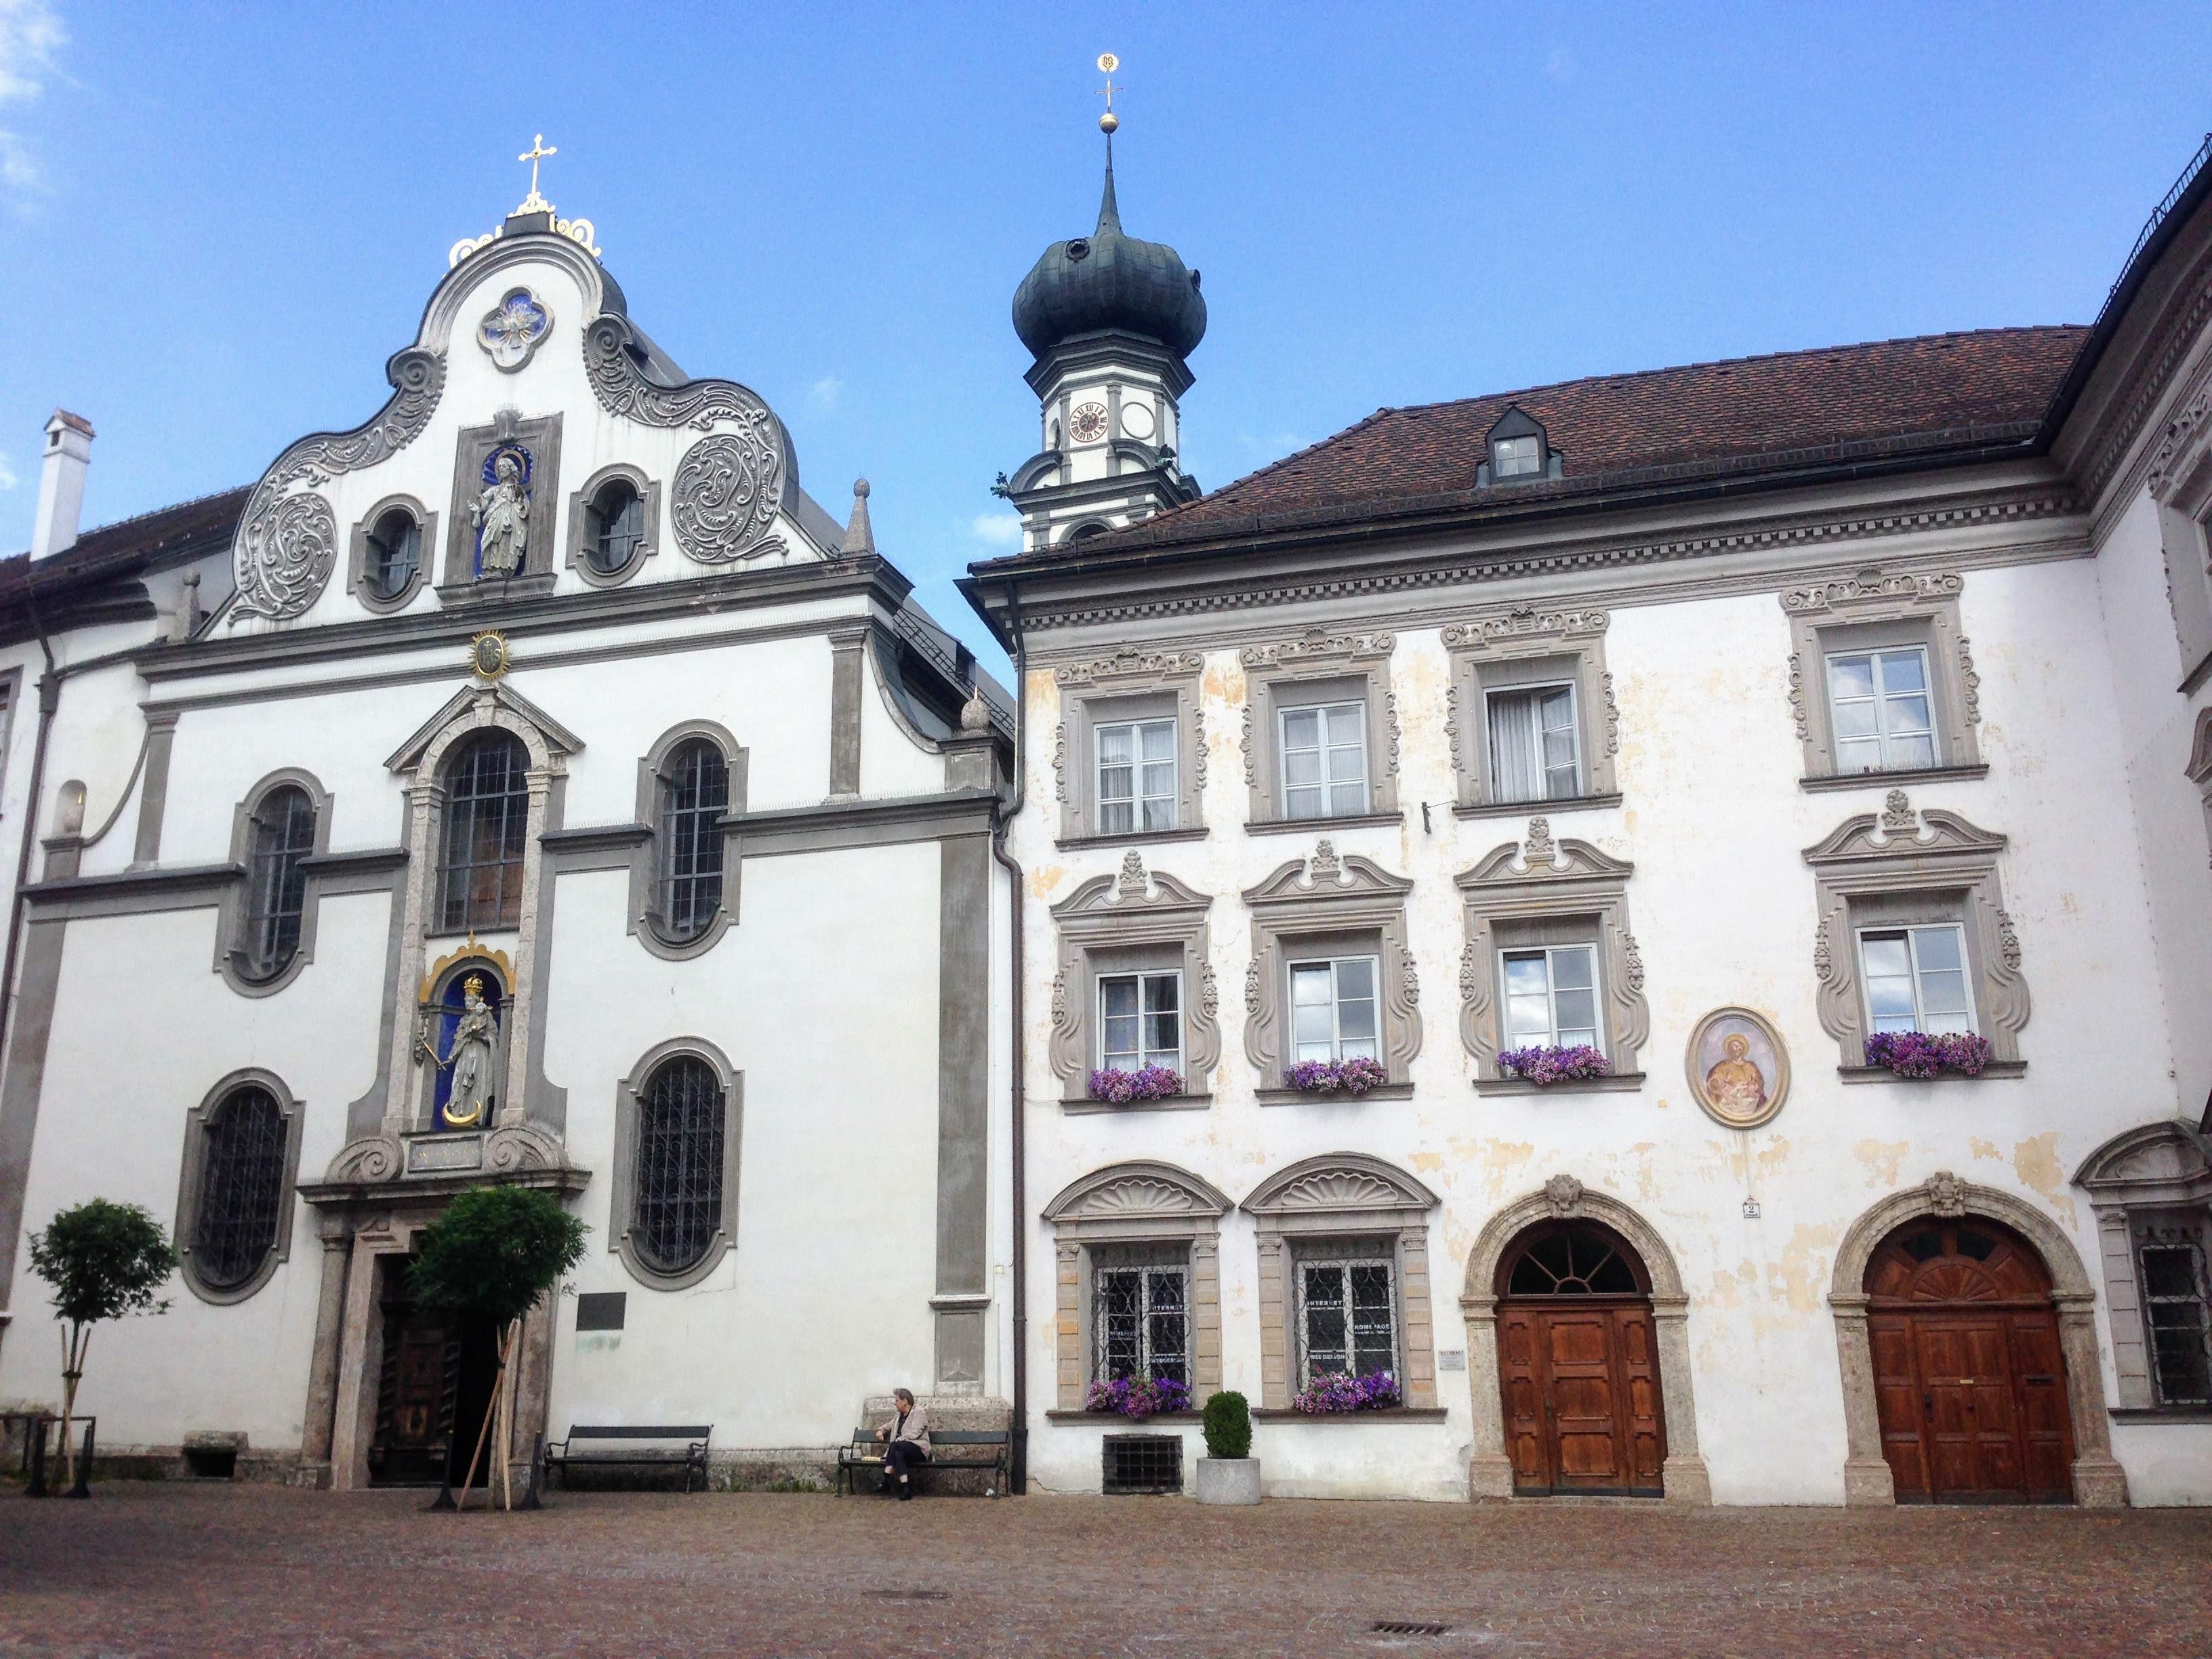 Hall in Tirol Innsbruck Austria